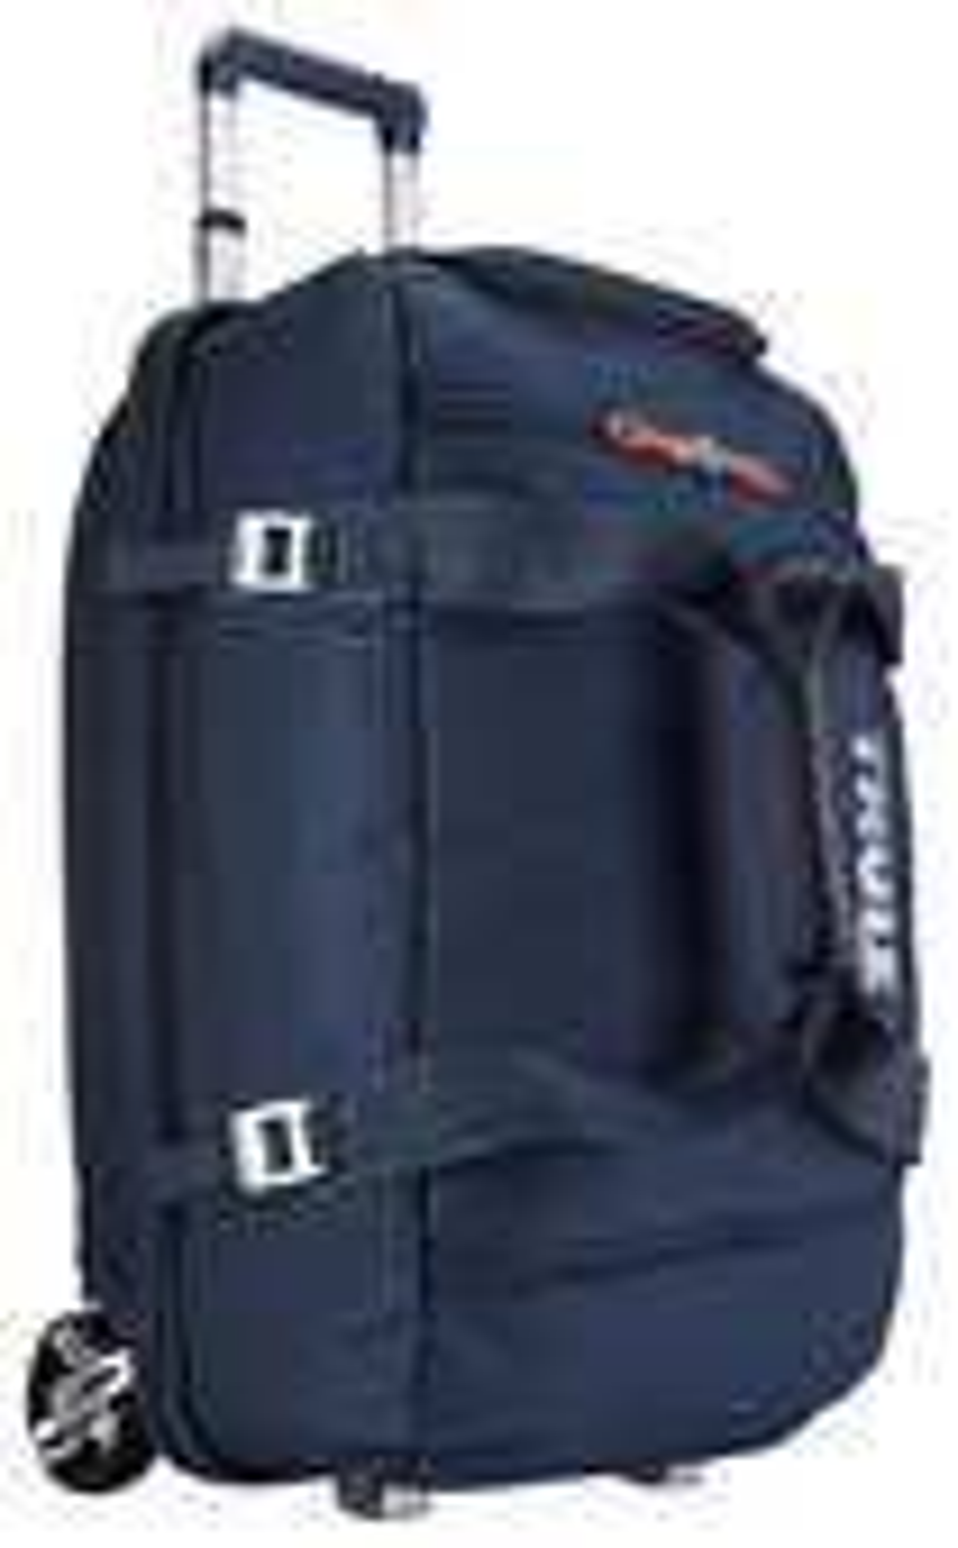 Thule - Crossover 56L Wheeled Duffel Bag - Stratus